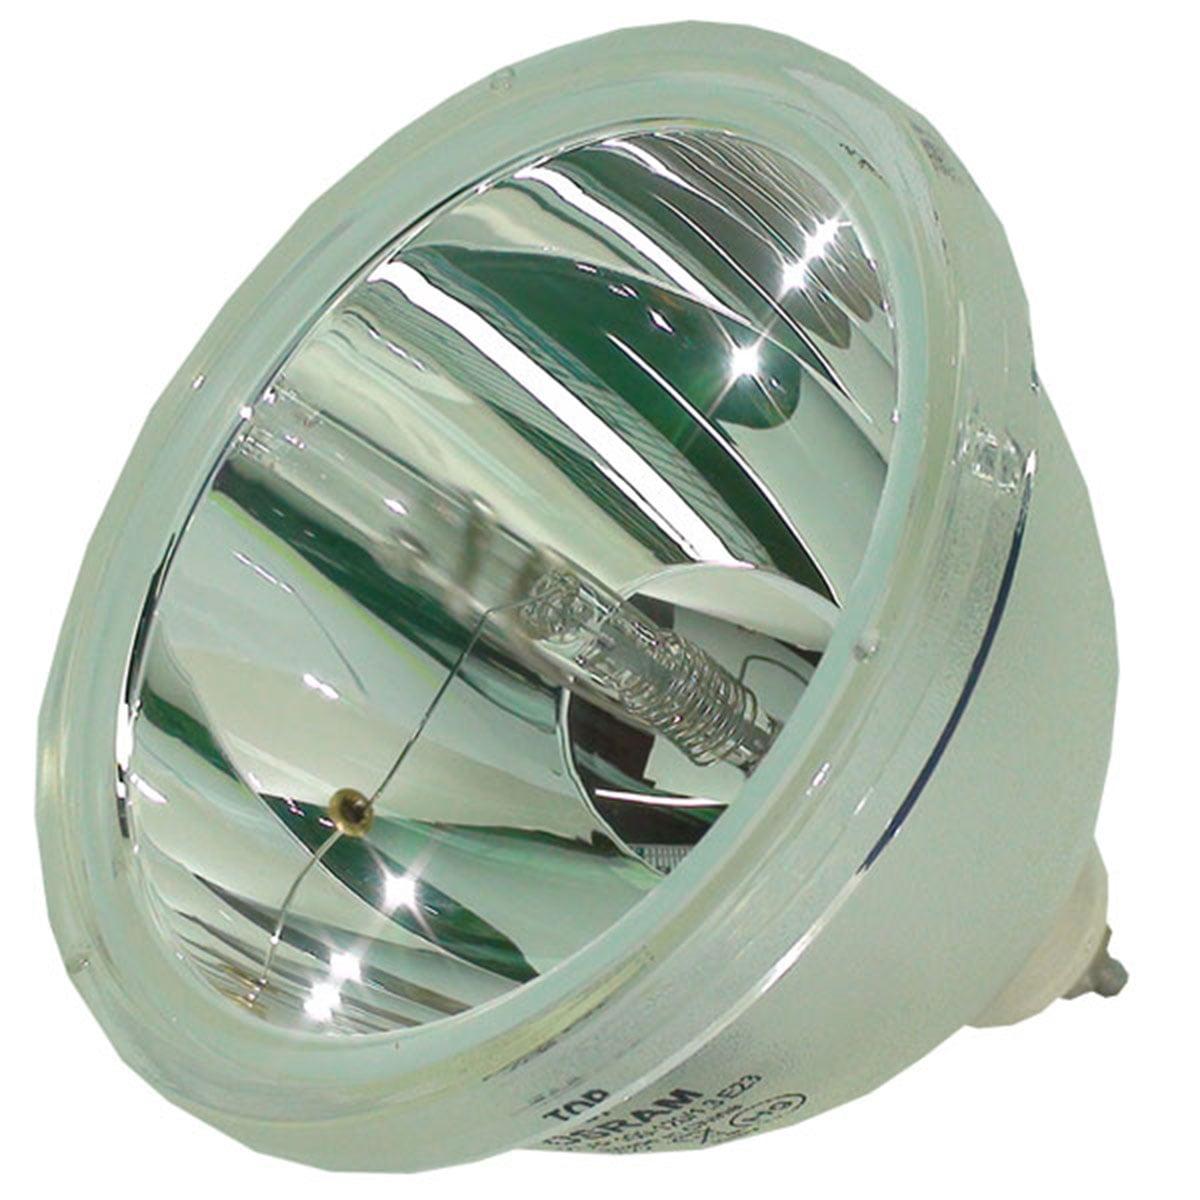 Osram Bare Lamp For Planar 990-1407 / 9901407 Projection TV Bulb DLP